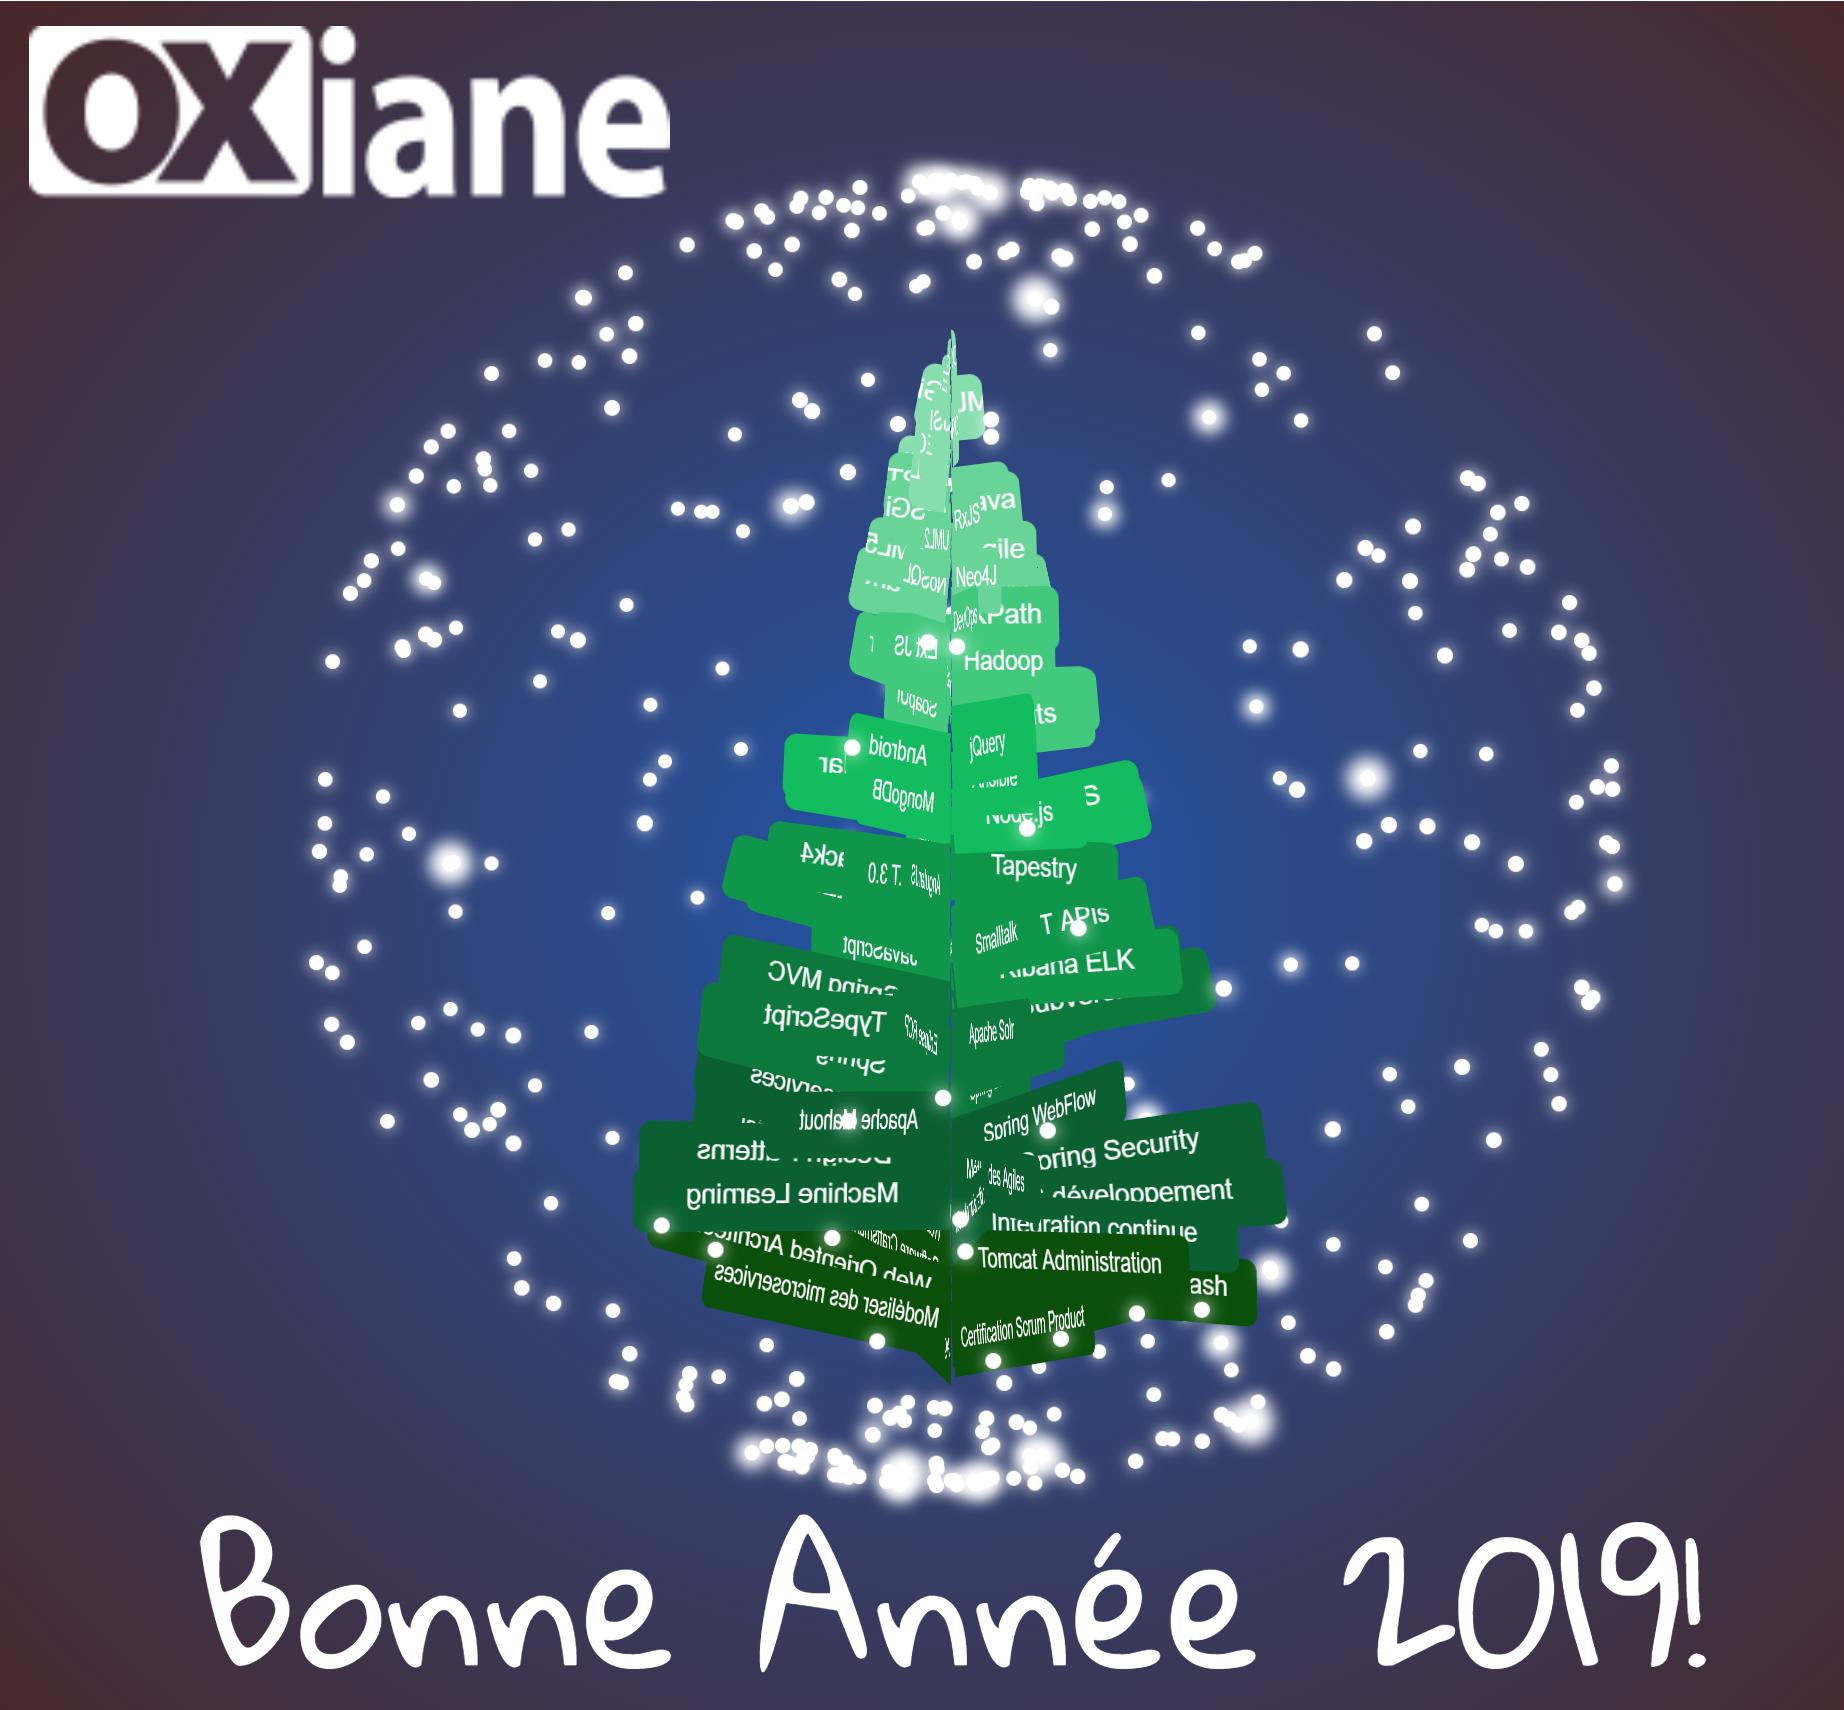 Image De Joyeux Noel 2019.Joyeux Noel Et Bonne Annee 2019 Oxiane